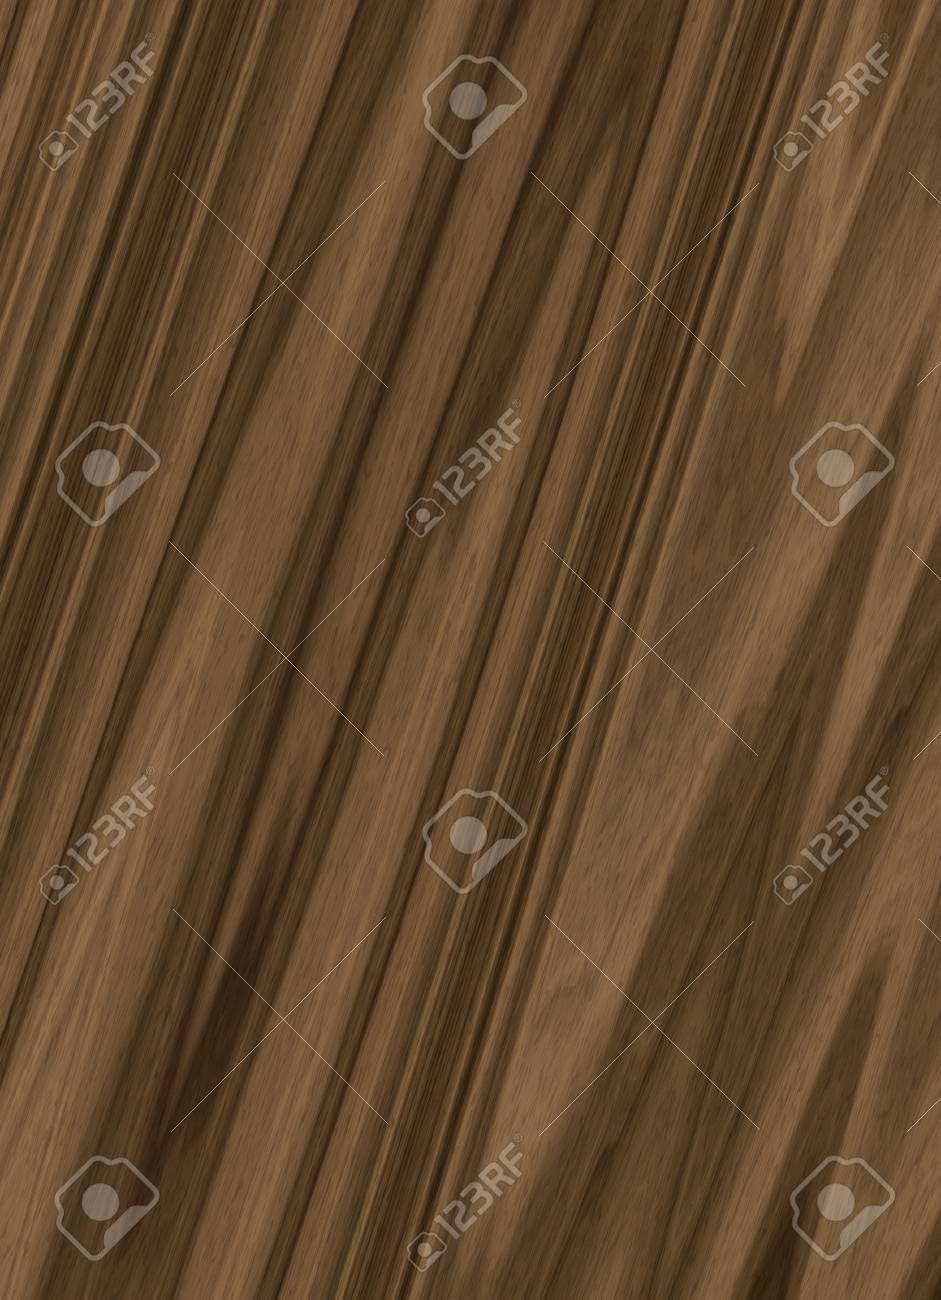 Wooden texture Stock Photo - 15663091